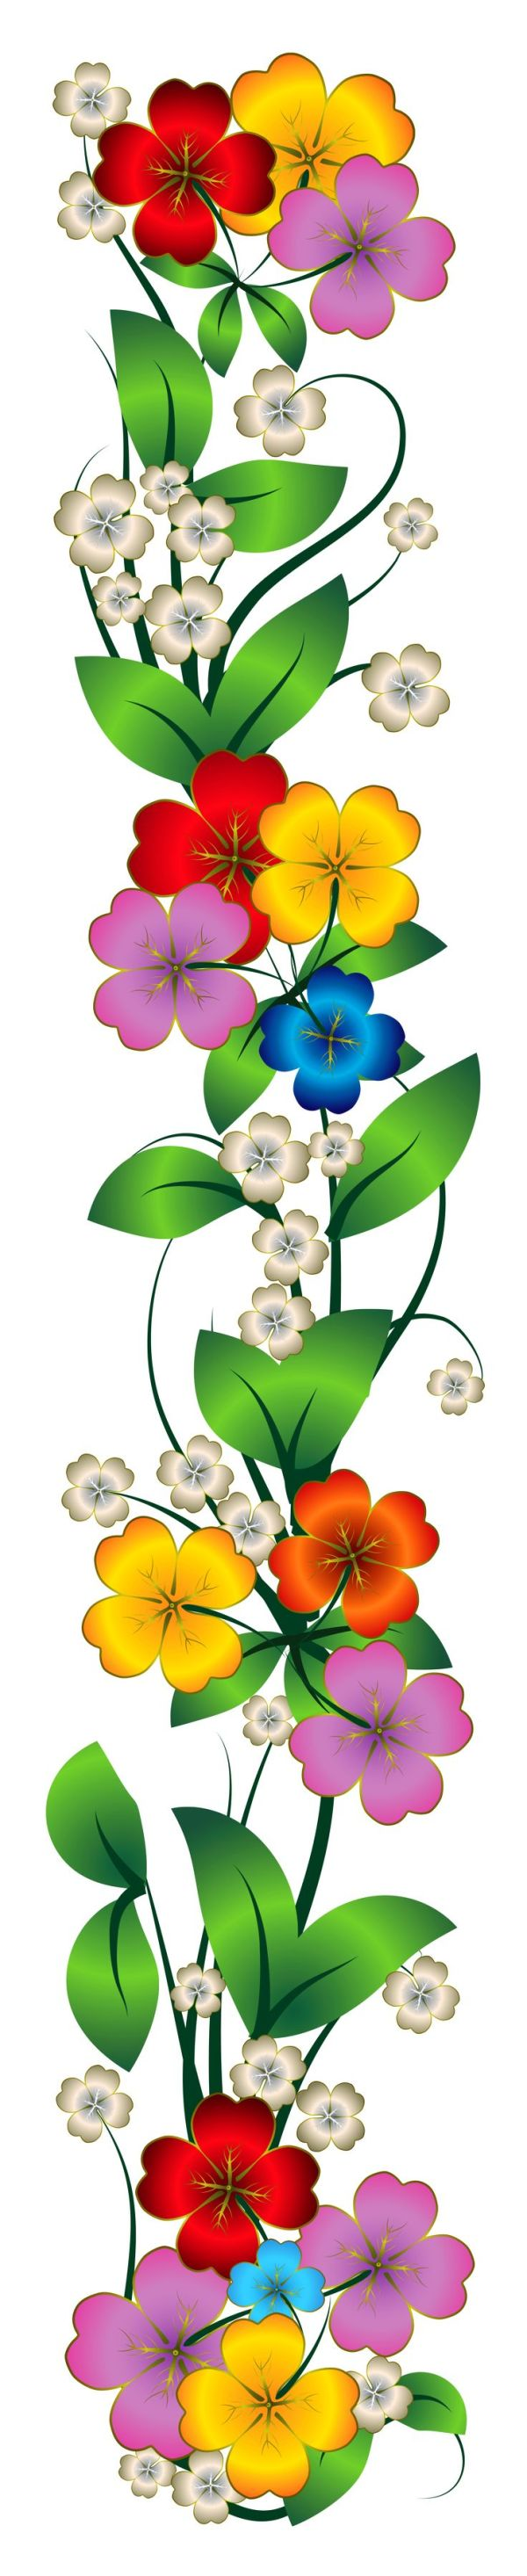 flowers decor clipart illustrations